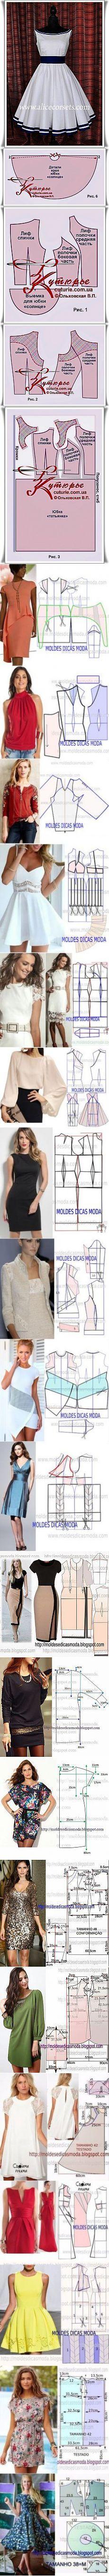 ru.pinterest.com Diy Sewing Projects, Sewing Hacks, Sewing Tutorials, Clothing Patterns, Dress Patterns, Sewing Patterns, Clothes Crafts, Sewing Clothes, Pattern Cutting